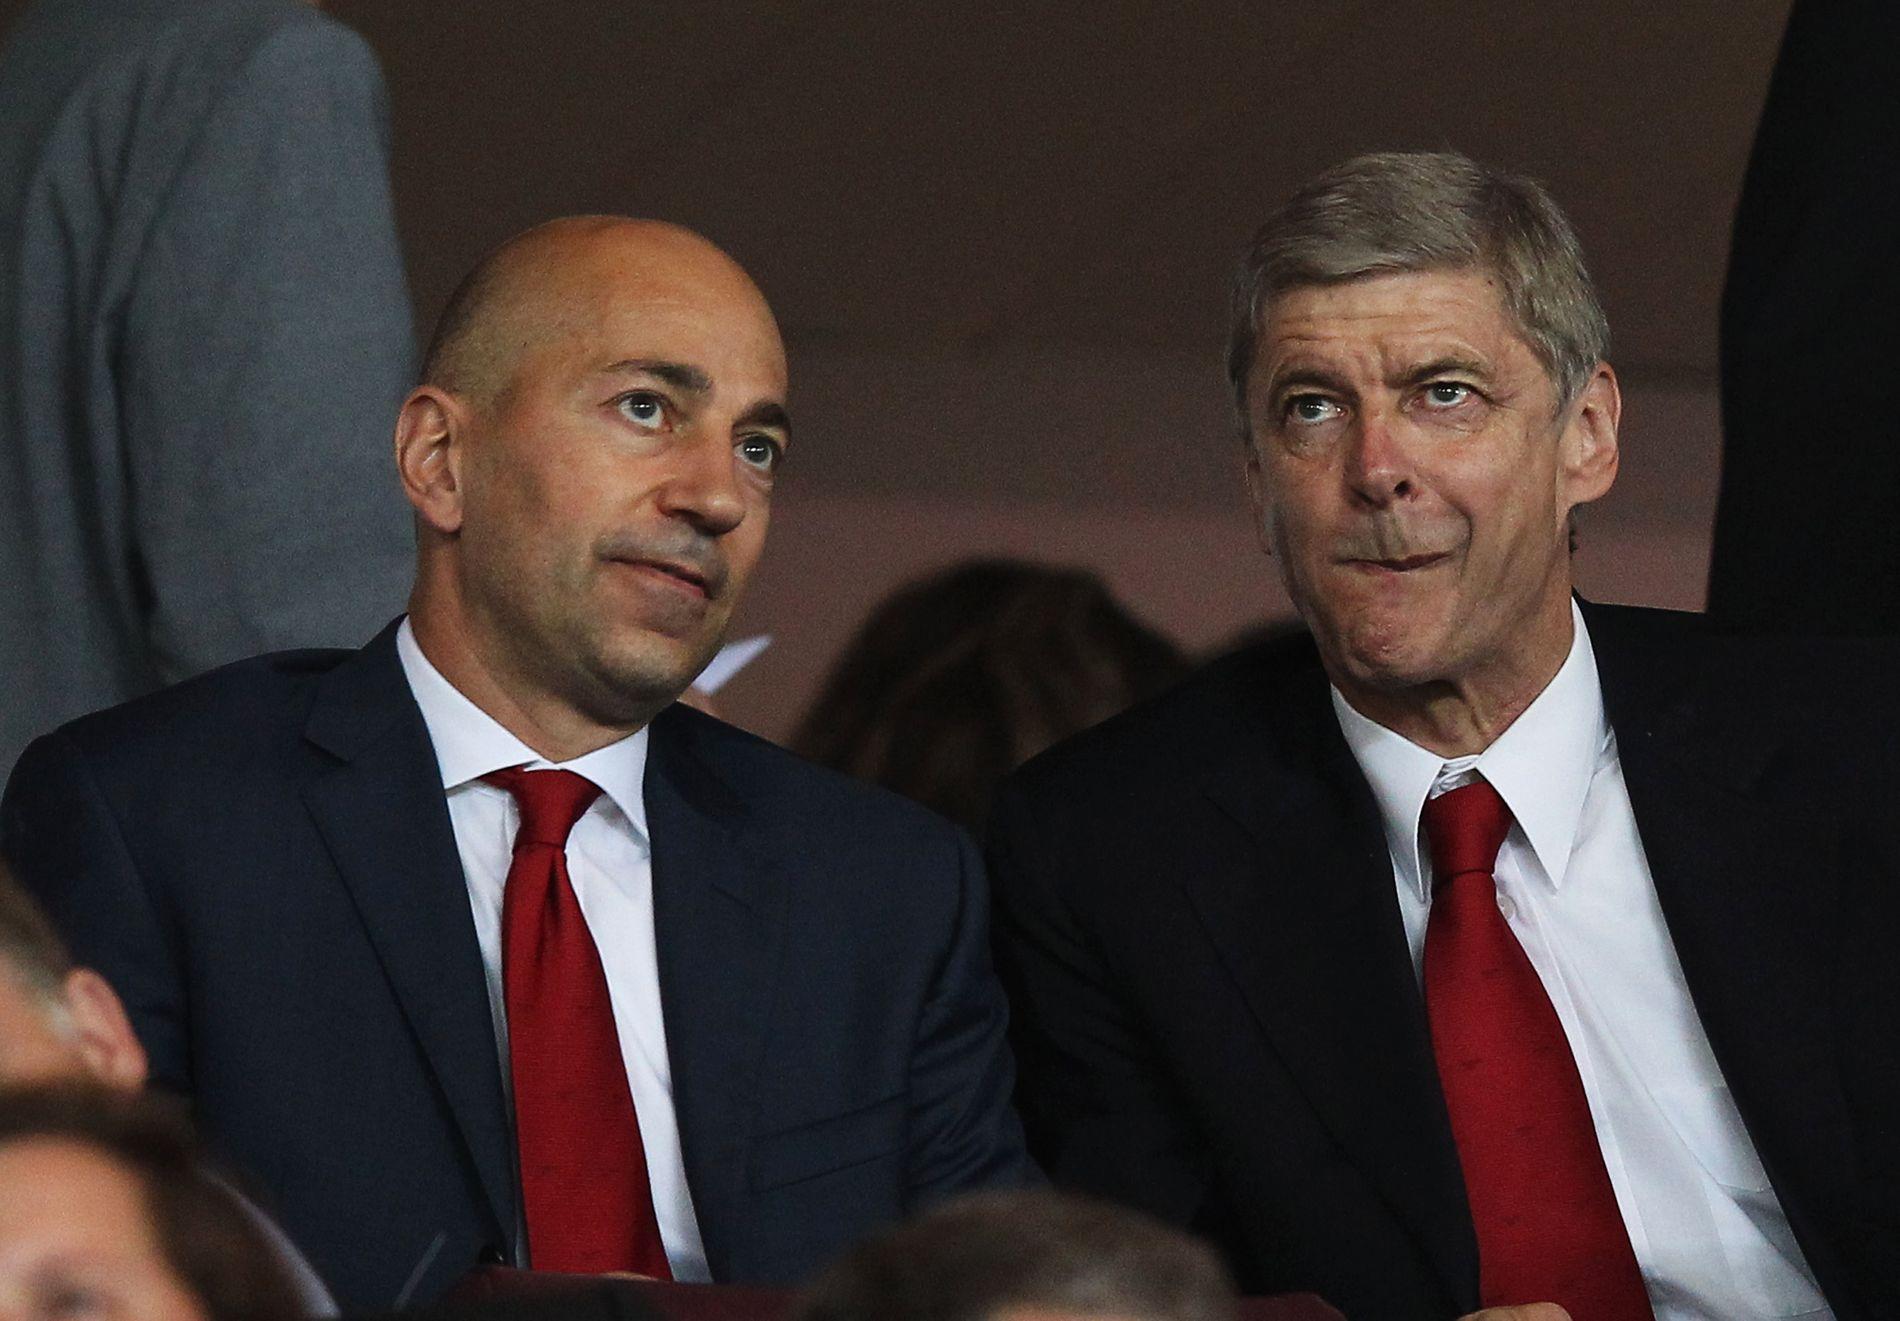 IKKE RÅD: Arsenal-direktør Ivan Gazidis og manager Arsène Wenger, her på Emirates Stadium i 2011, har ikke kjøpt mange spillere denne sommeren.